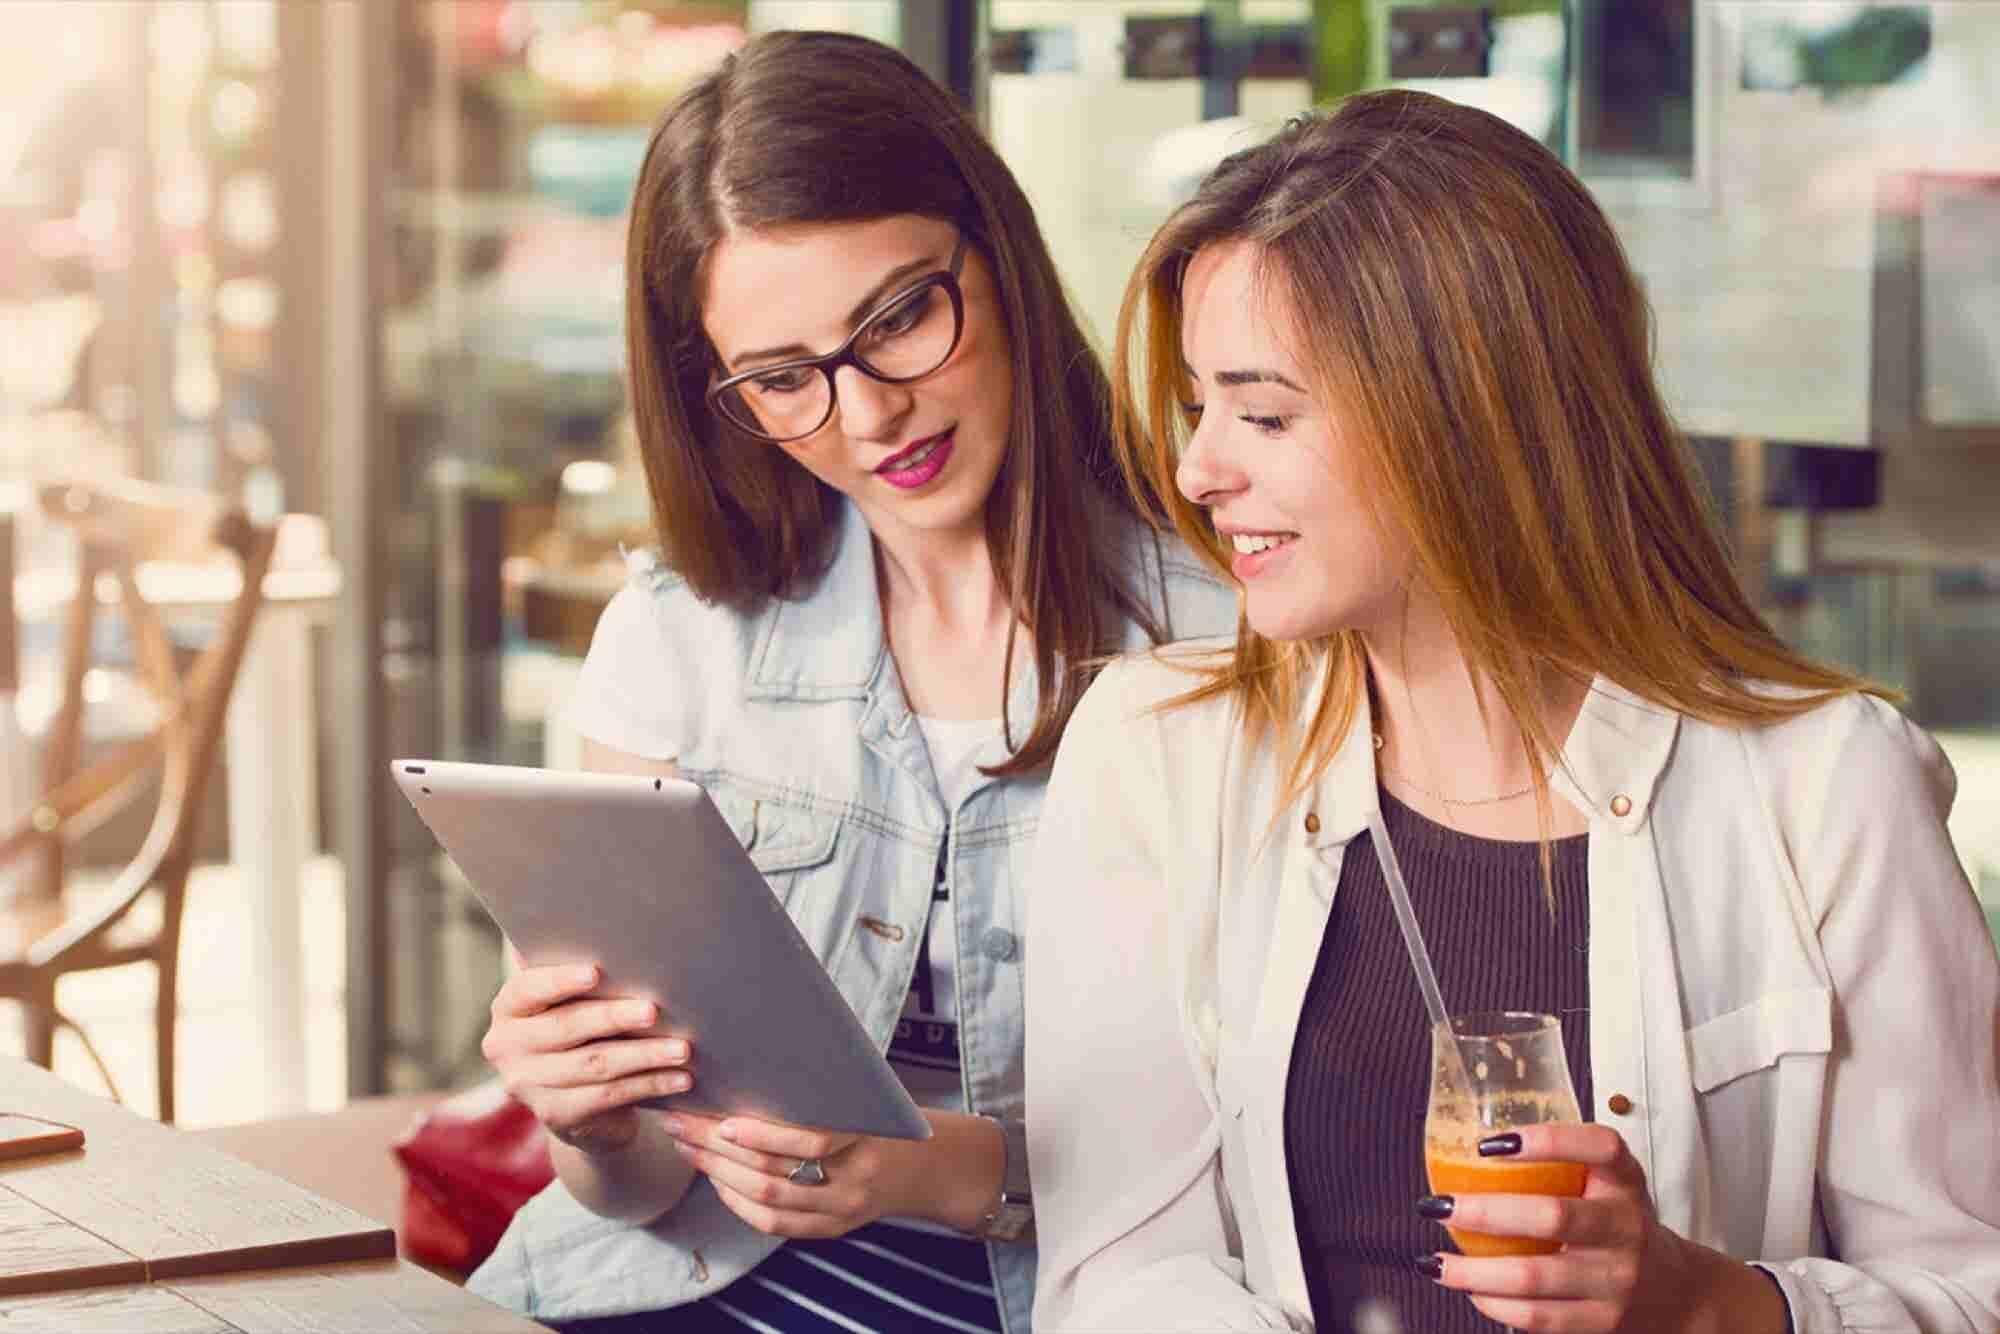 5-Point Advice To Women Tech Entrepreneurs